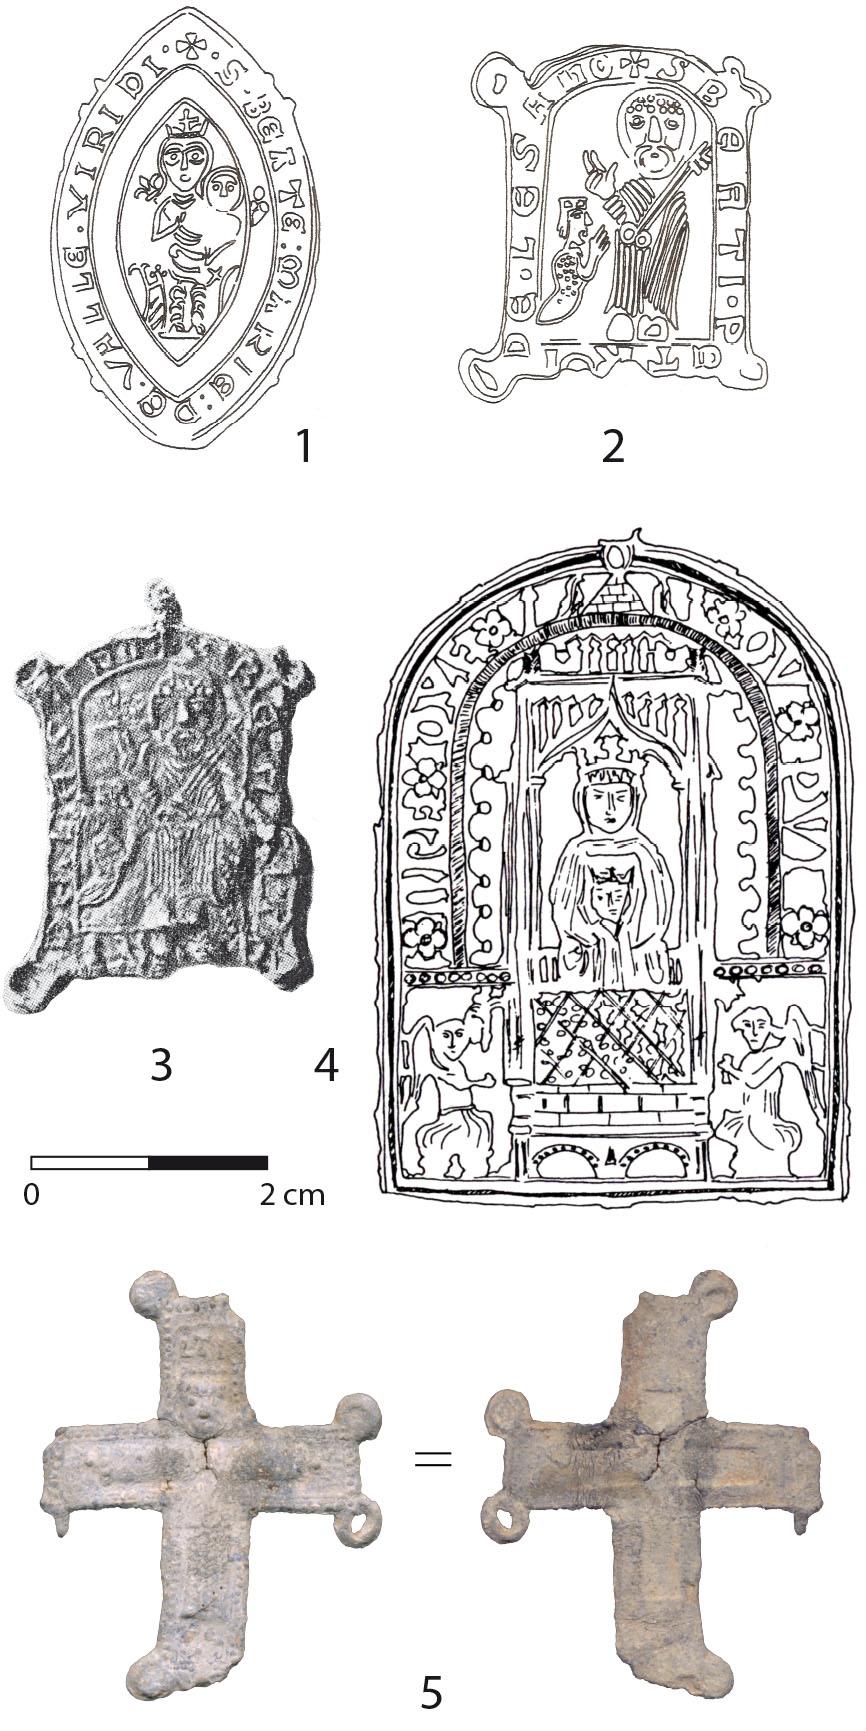 URL, http   journals.openedition.org archeomed docannexe image  2760 img-16.jpg 2ec934dacbc